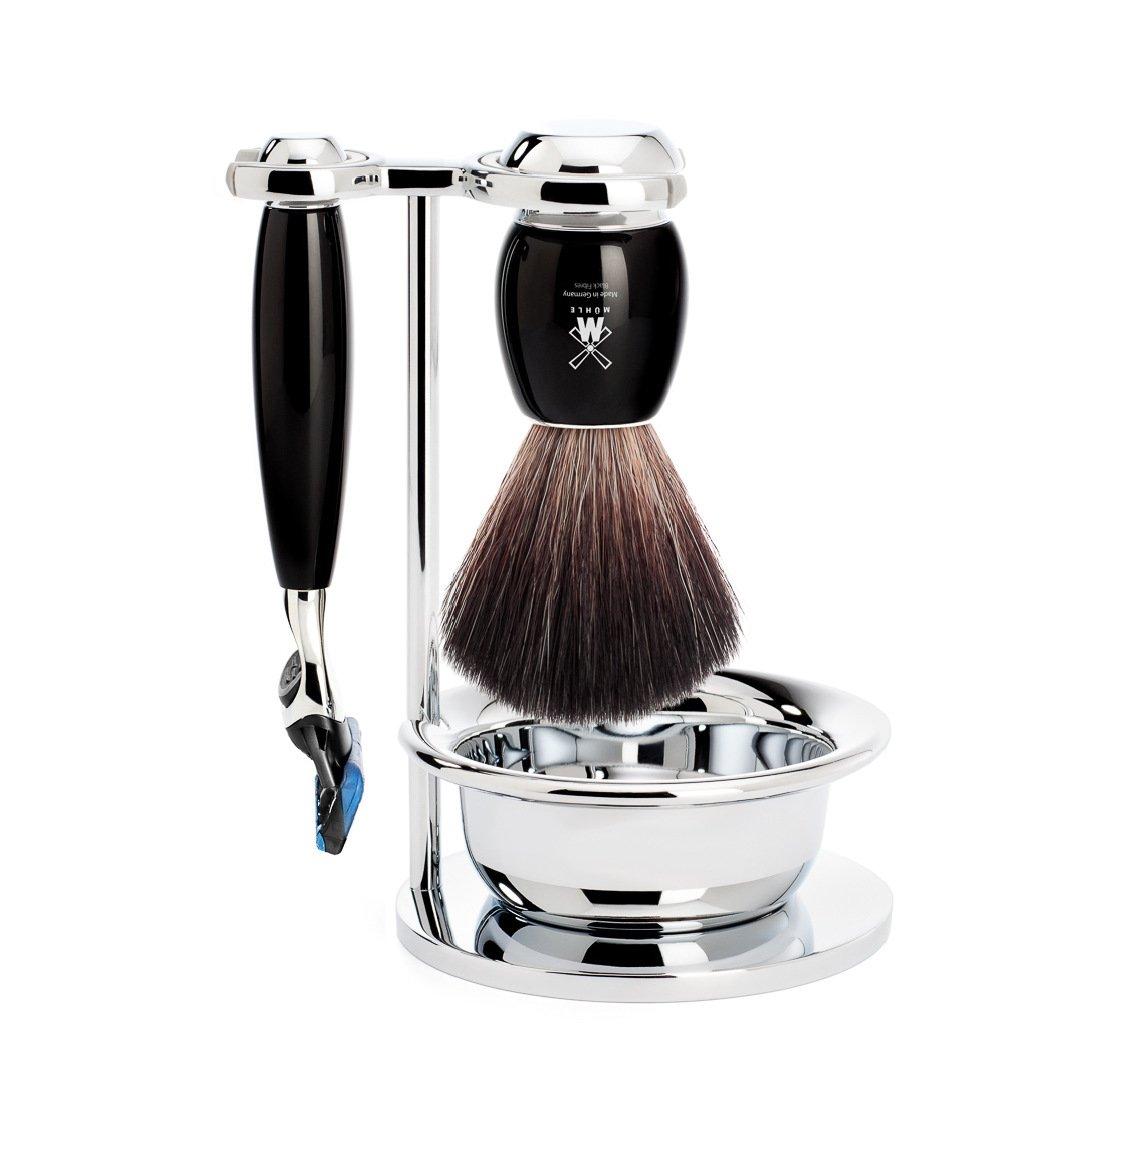 Muhle Black Fibre Brush and Gillette Fusion Blade Razor